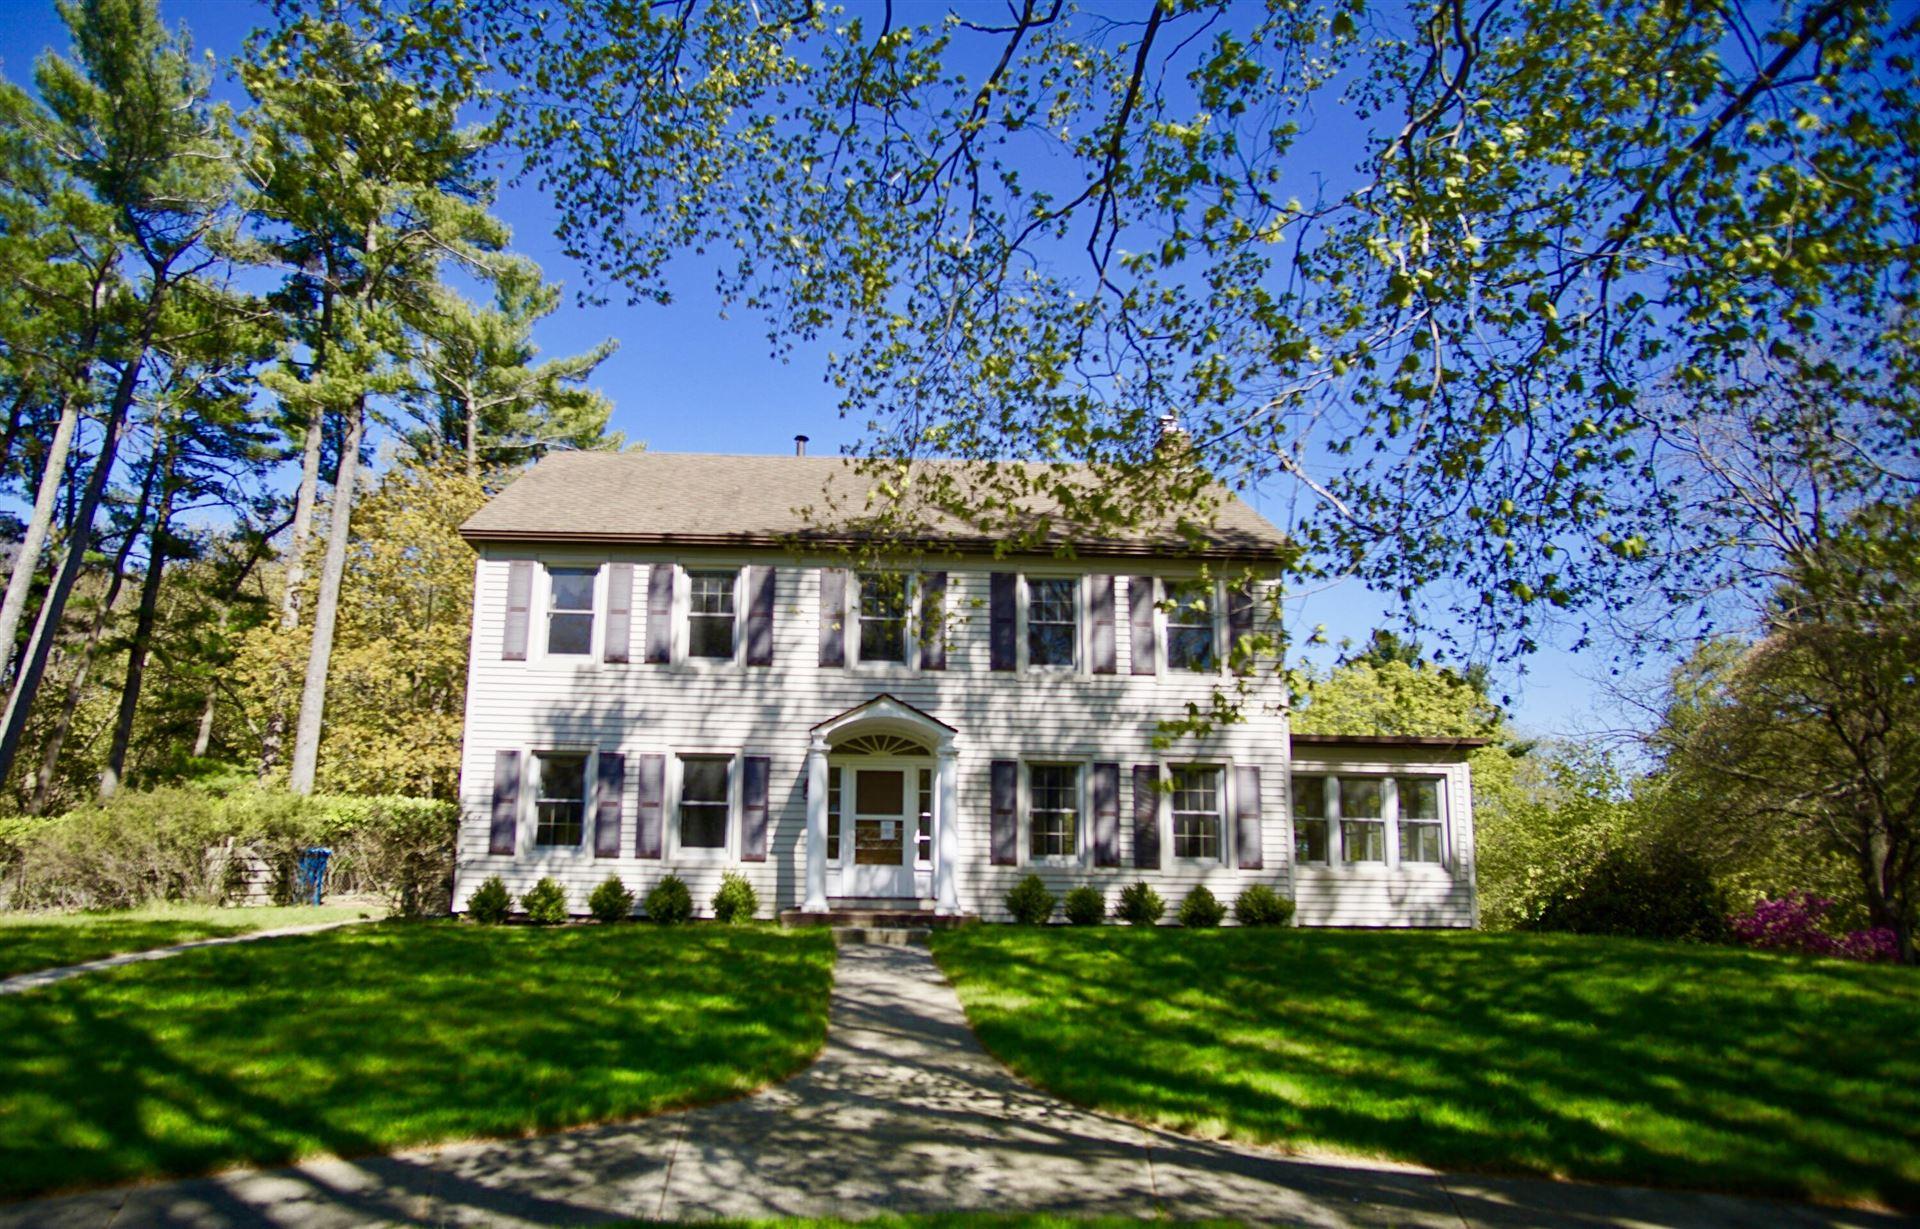 Photo of 824 Lake Avenue, Grand Haven, MI 49417 (MLS # 21110346)